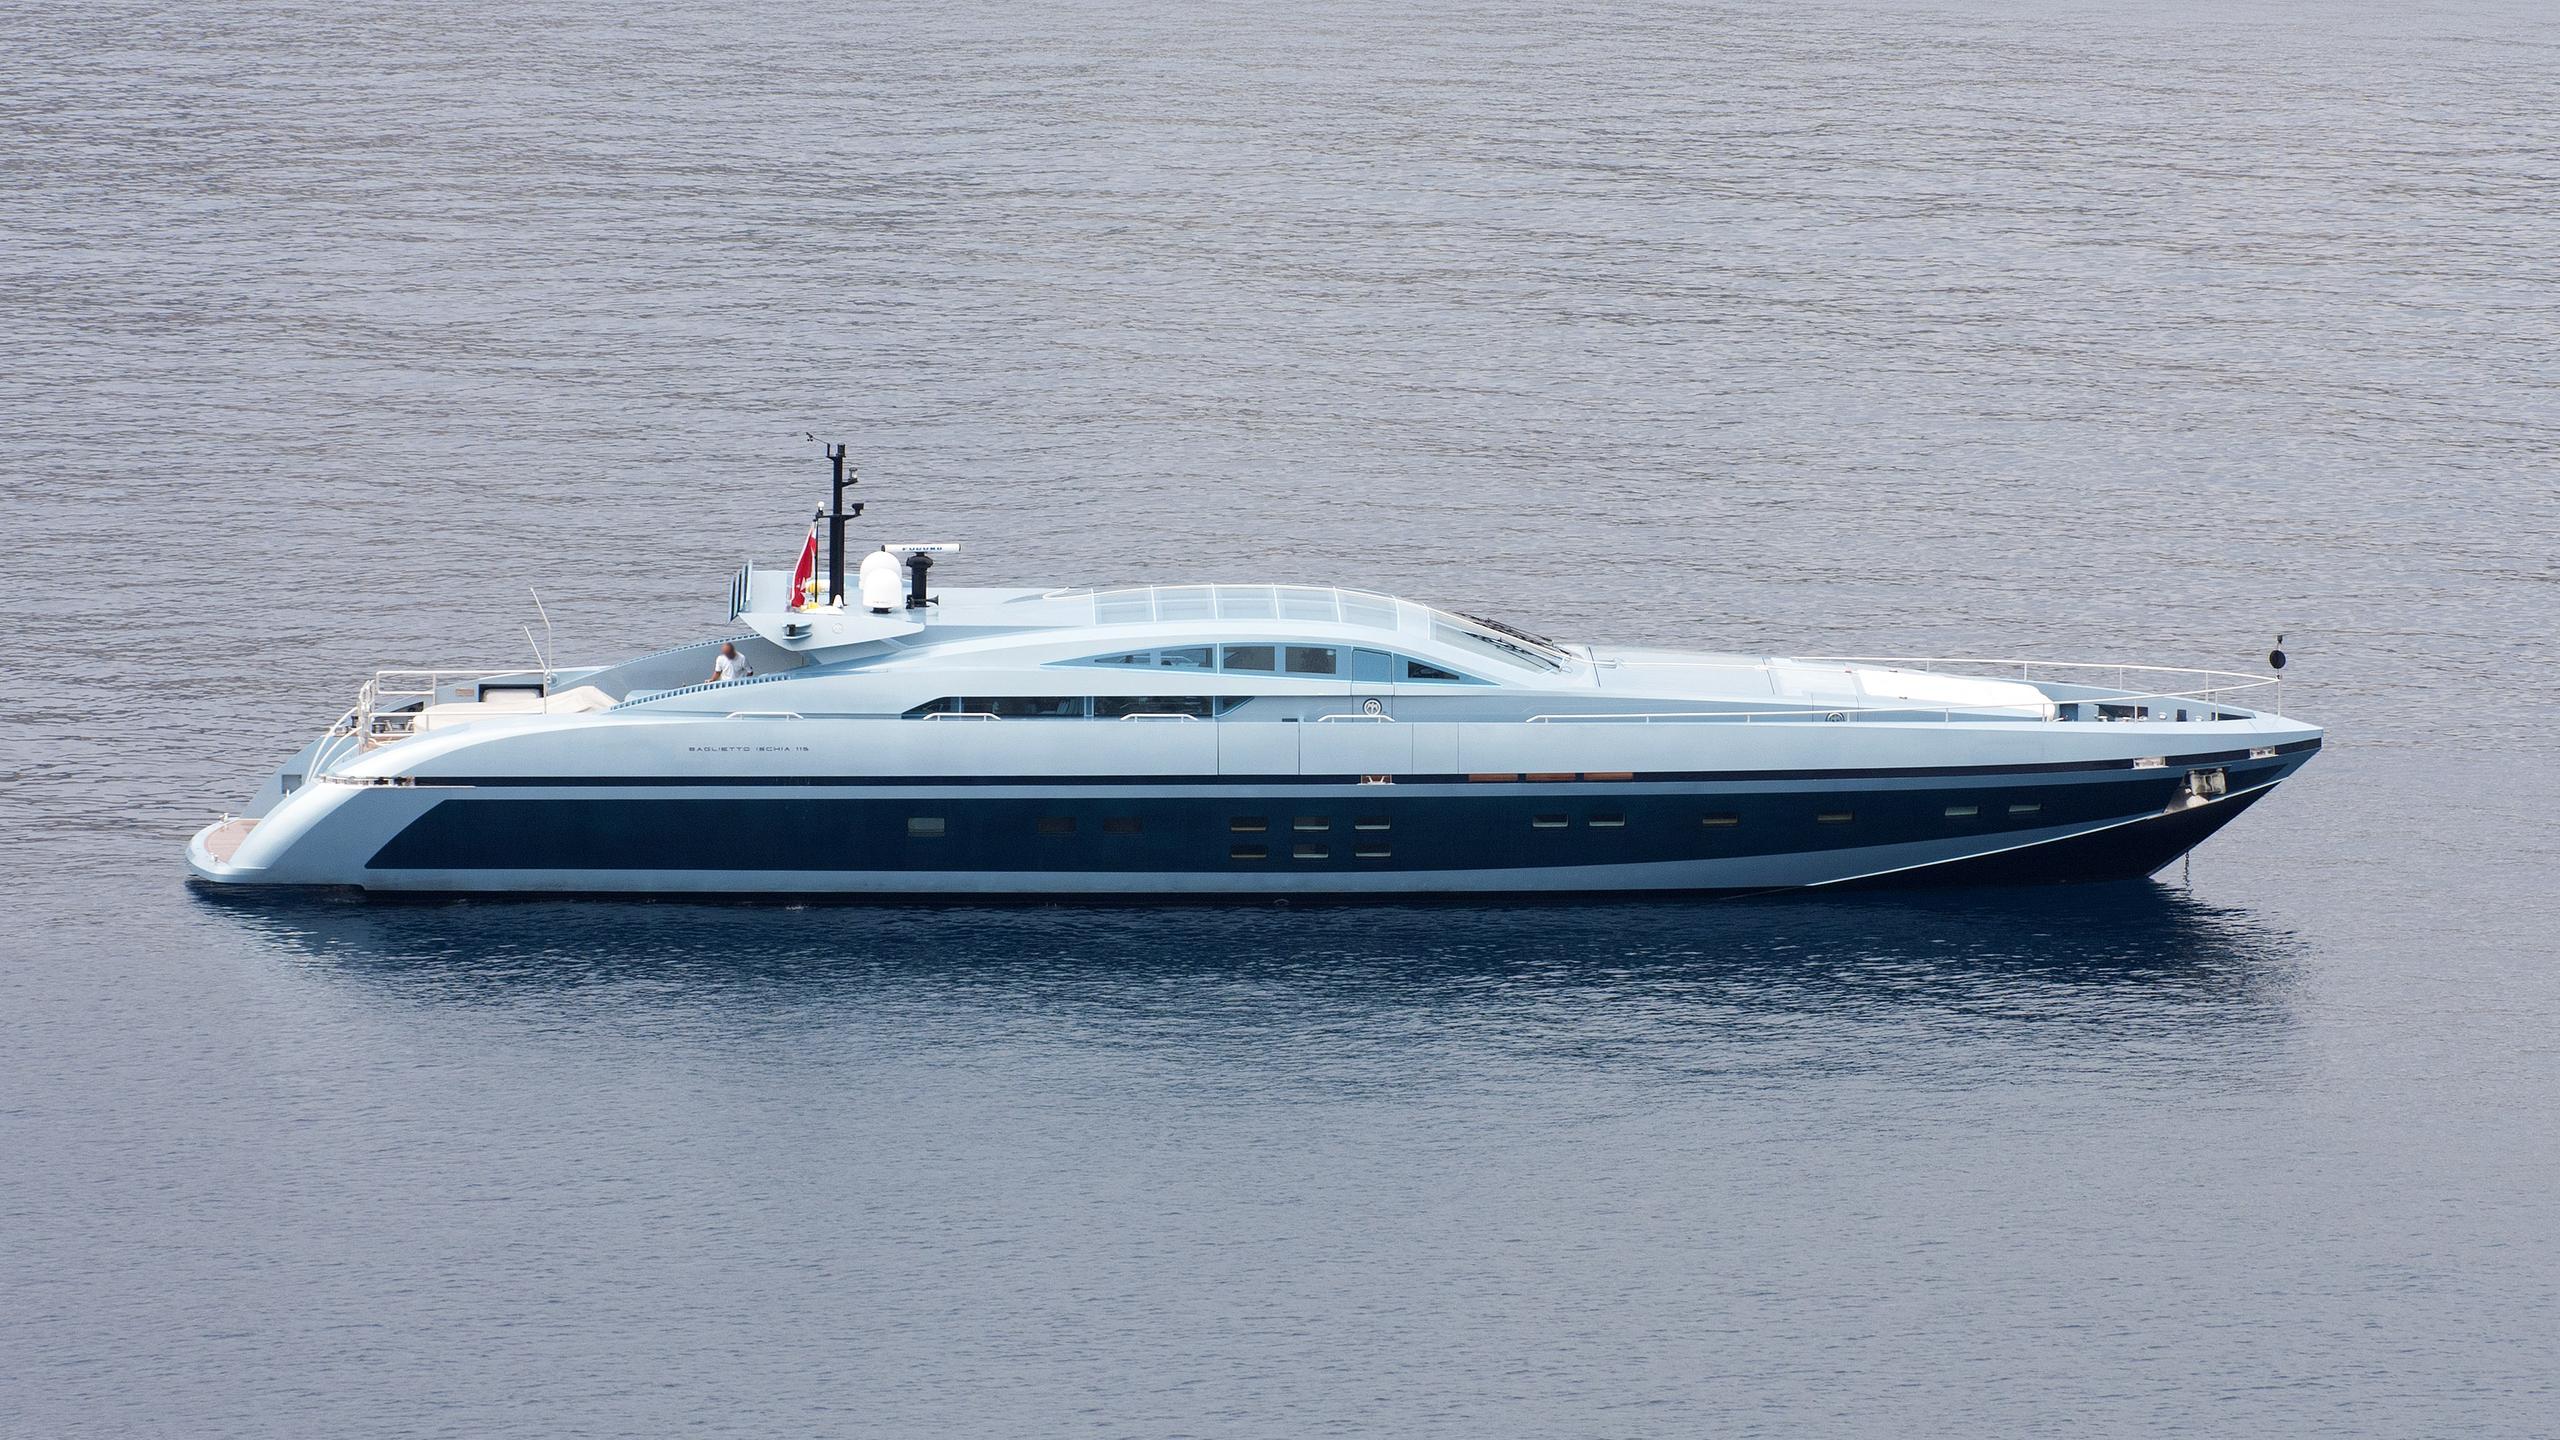 blue-princess-star-motor-yacht-baglietto-112-ht-2005-34m-profile